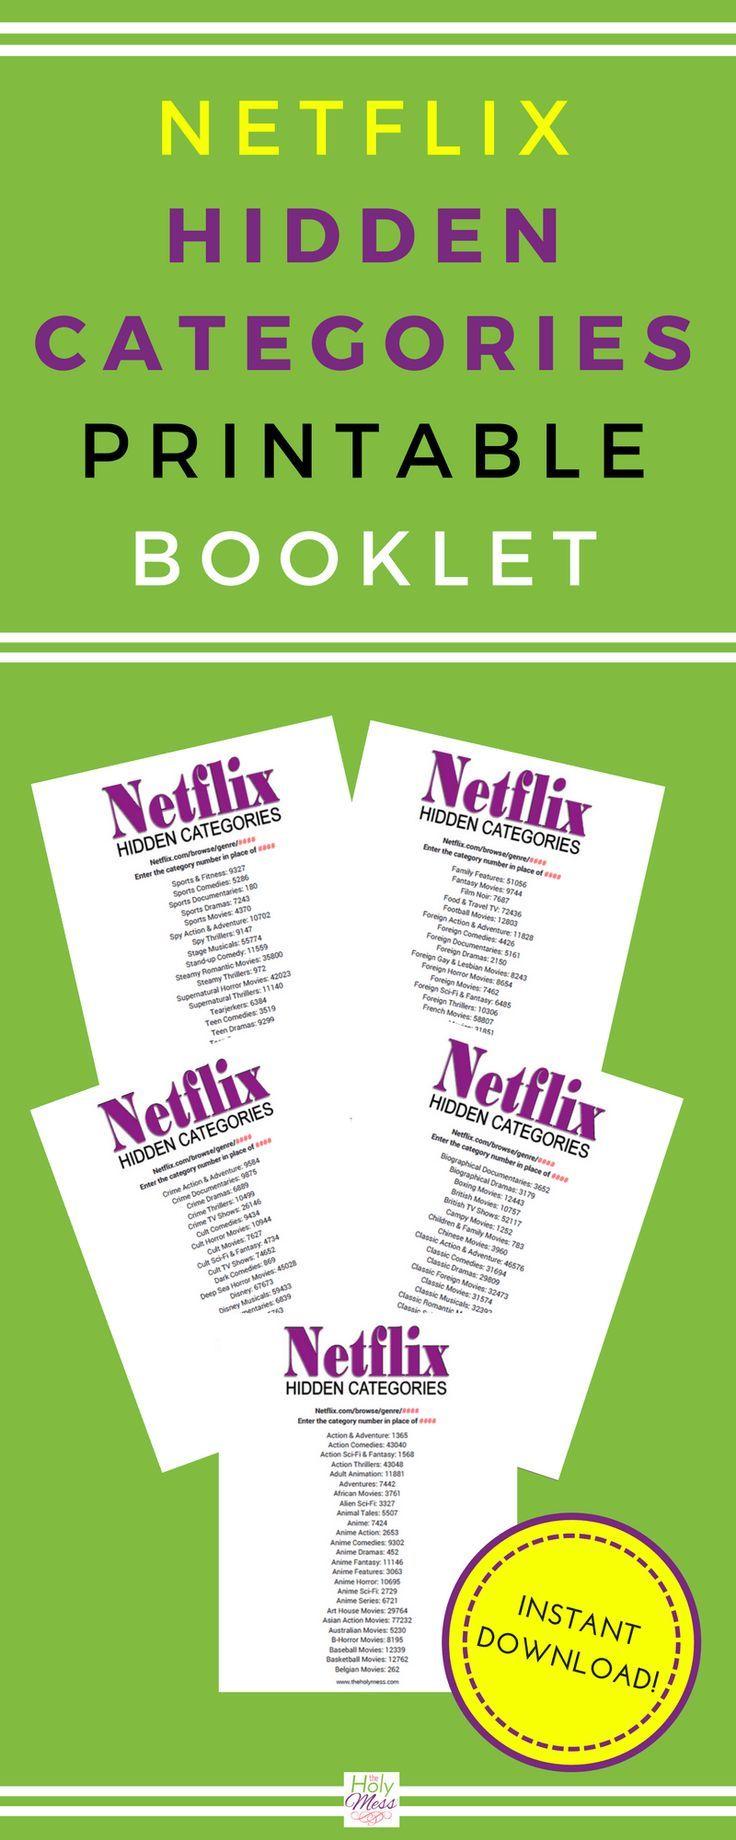 Netflix hidden categories printable booklet printables pinterest